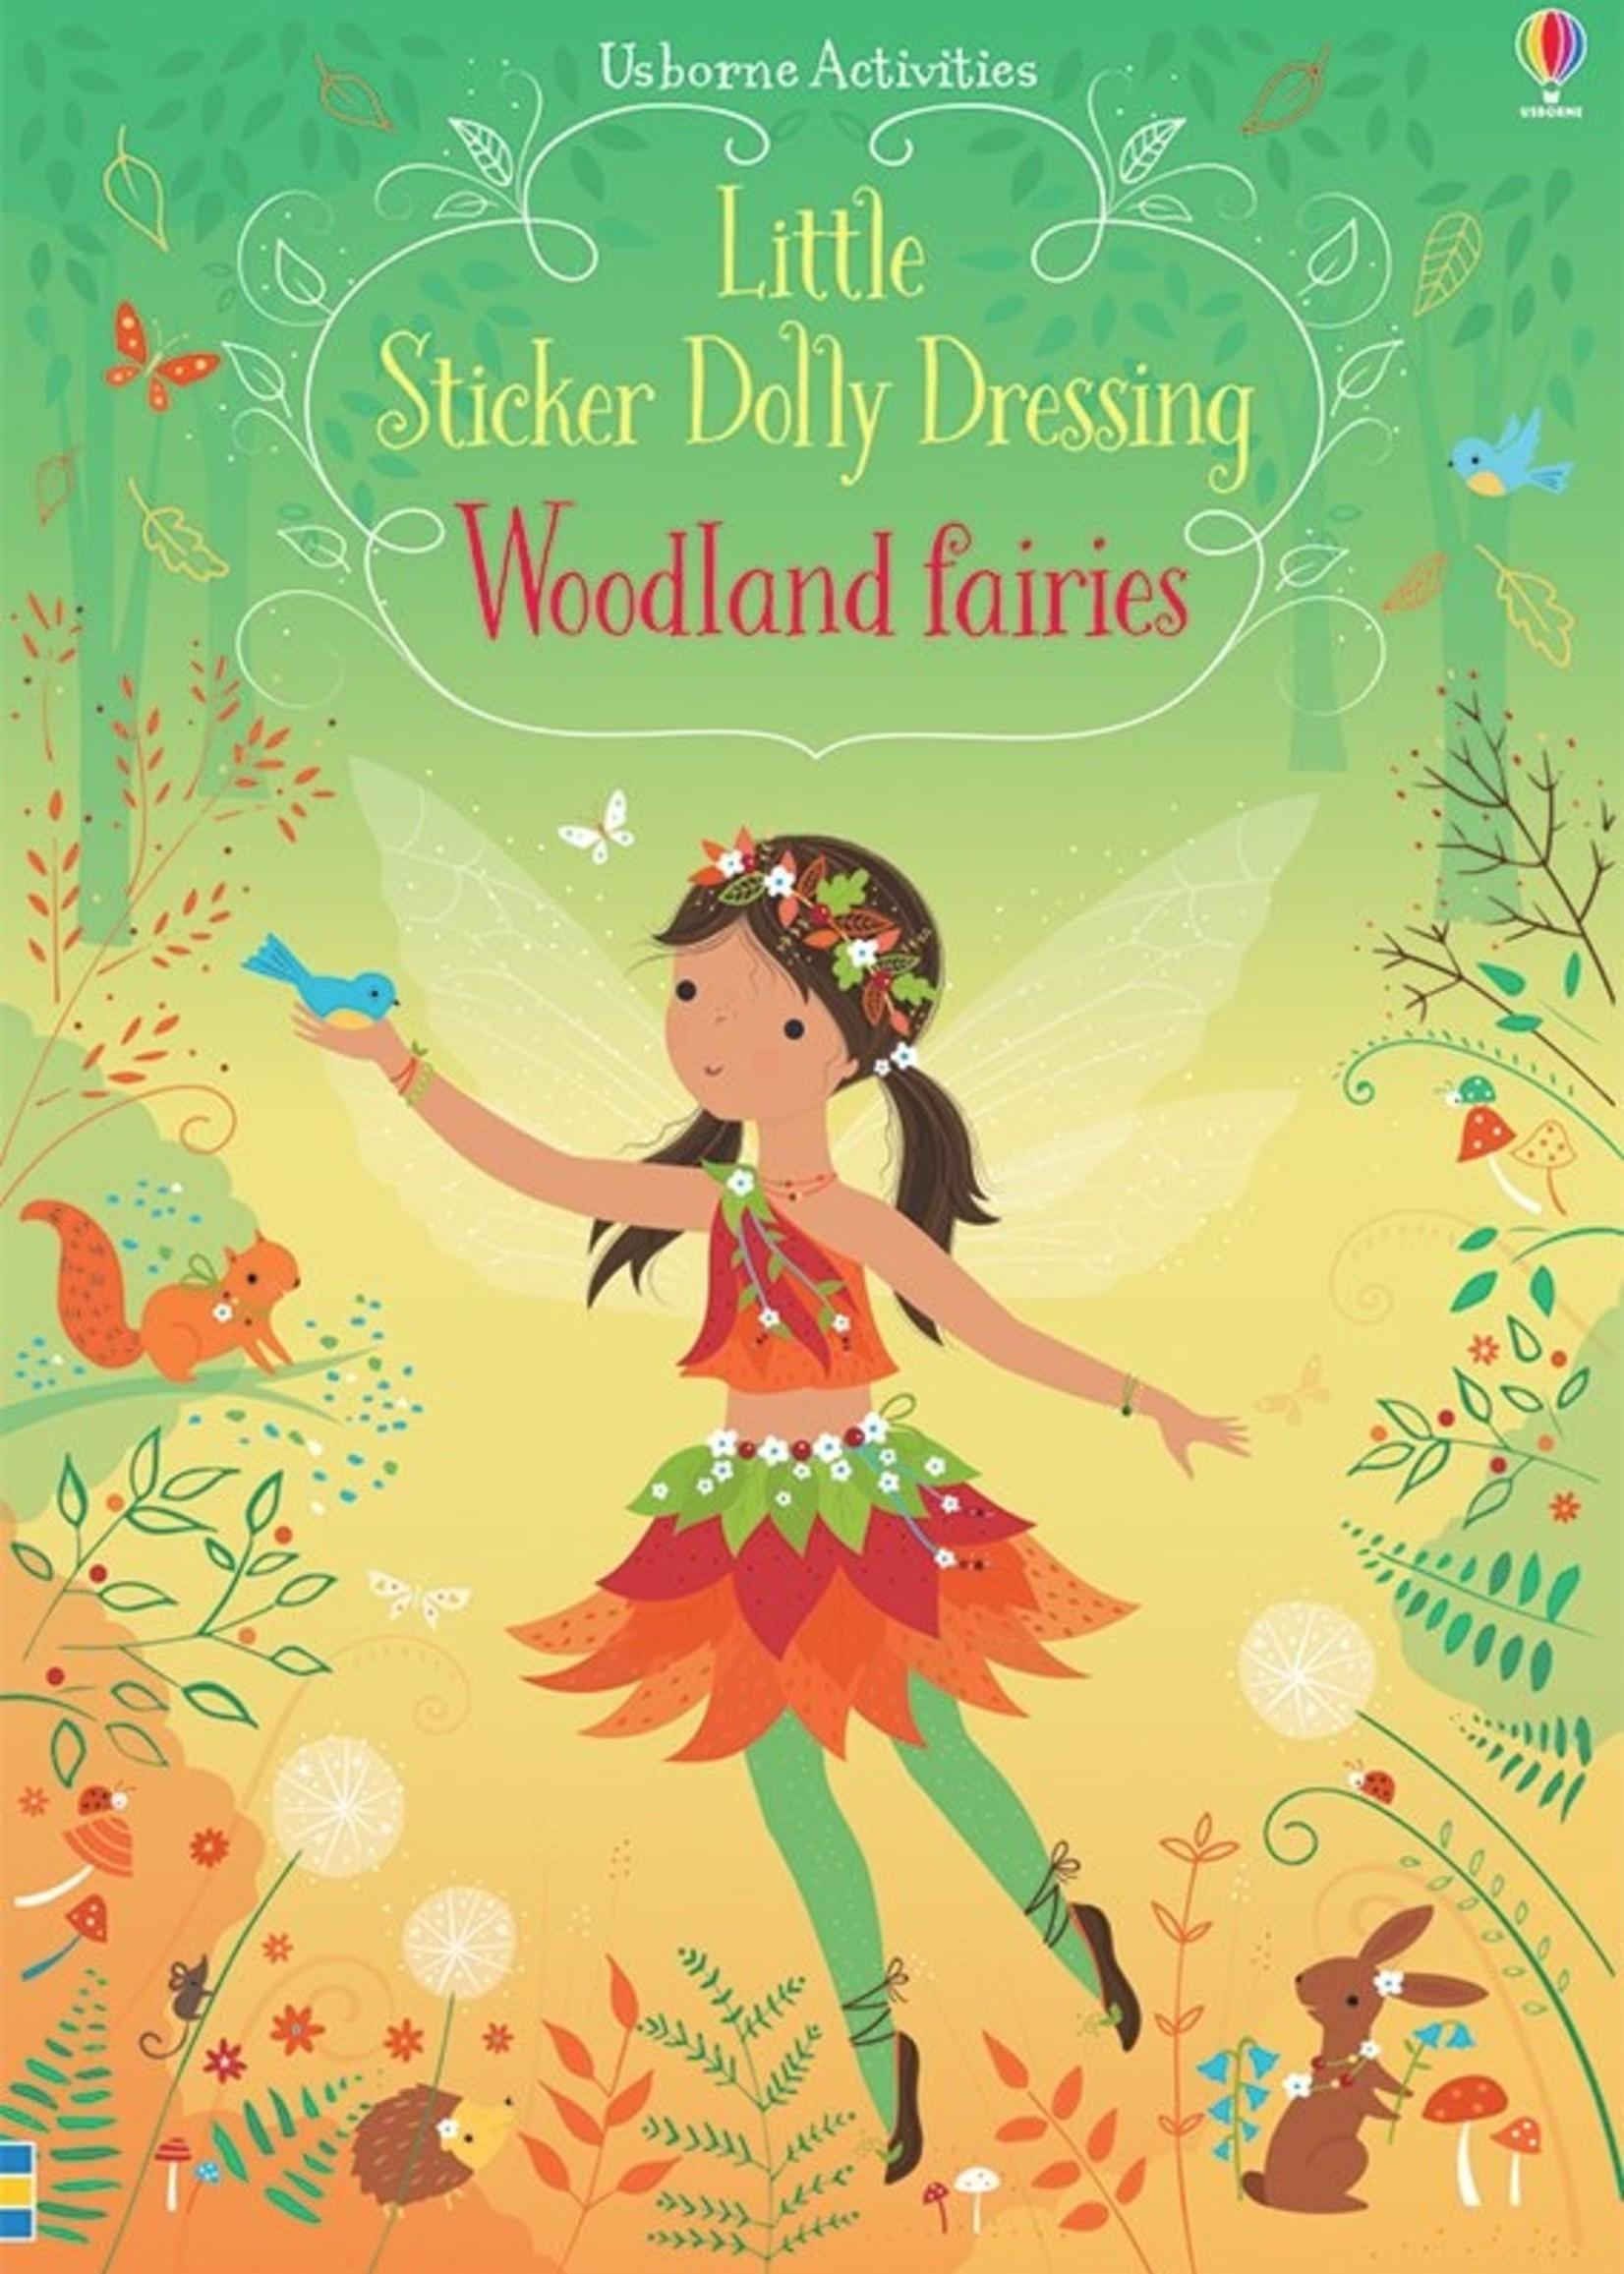 Usborne Little Sticker Dolly Dressing Woodland Fairies - Paperback